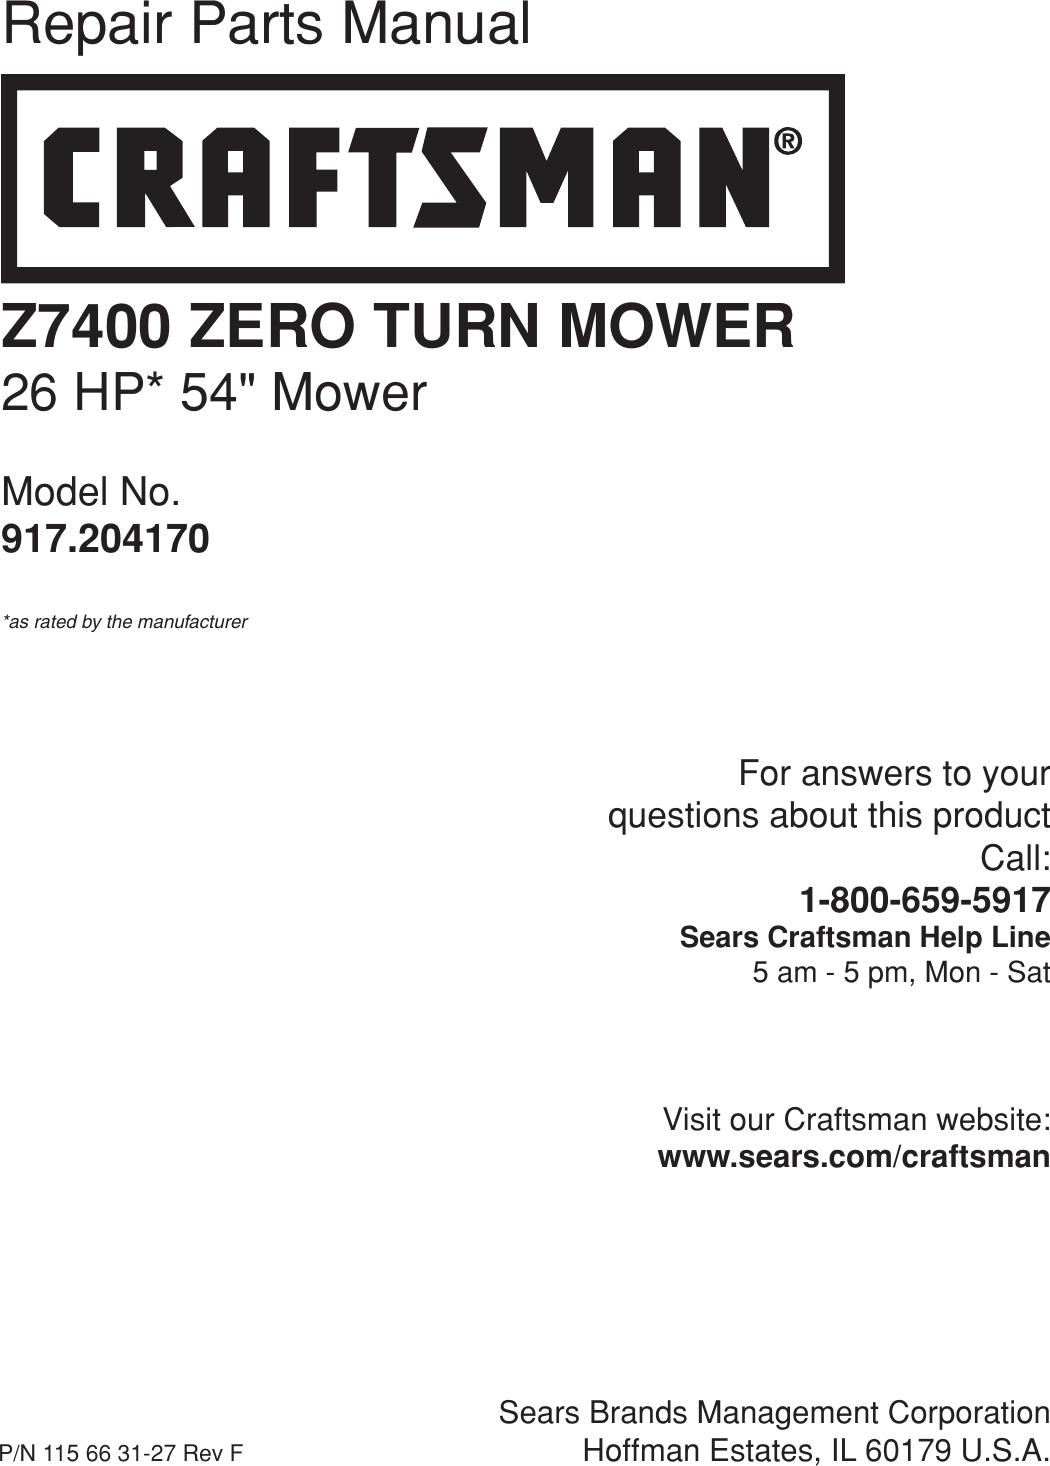 Craftsman Pro Series 54 26 Hp V Twin Z7400 Zero Turn Riding